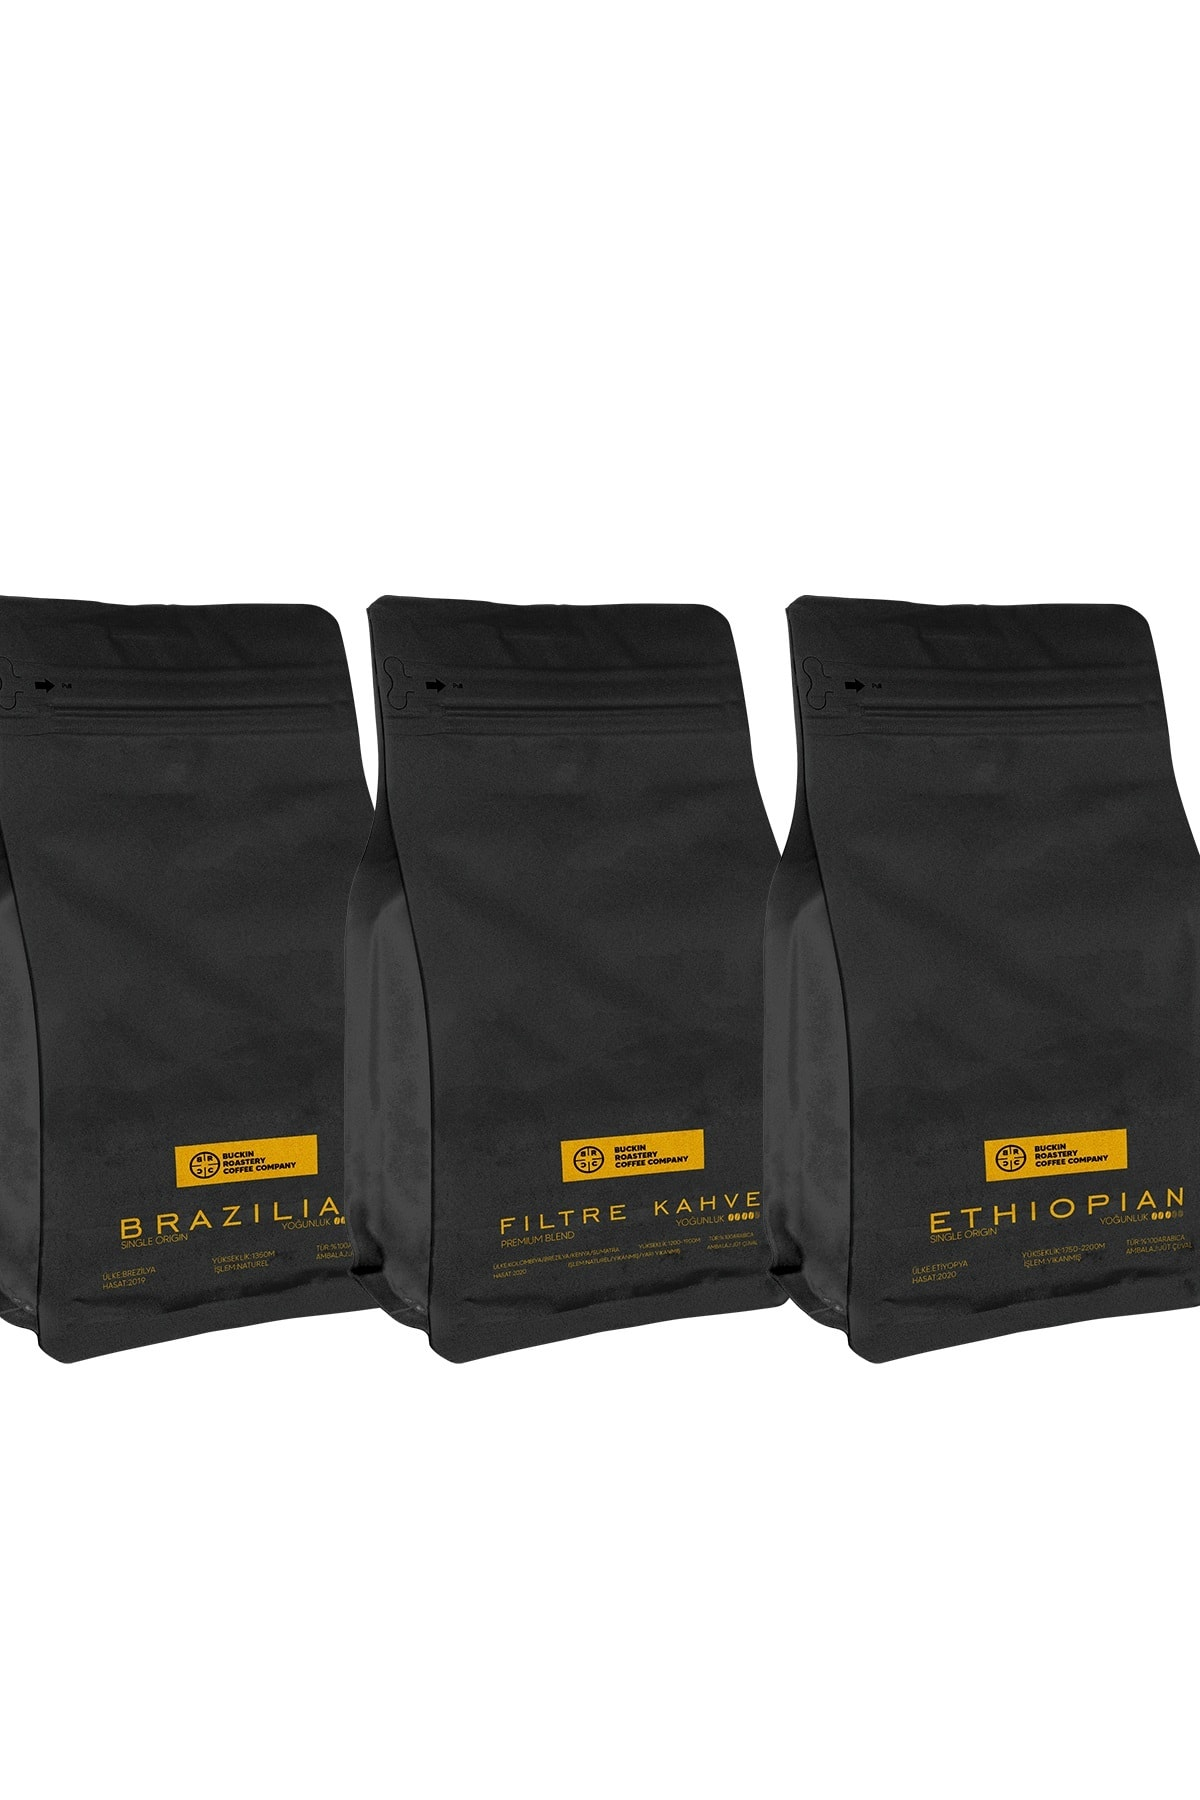 Buckin 3x200 gr Filtre Kahve Paketi Filtre Kahve Makinesi Ve French Press Uyumlu Tanışma Paketi 1